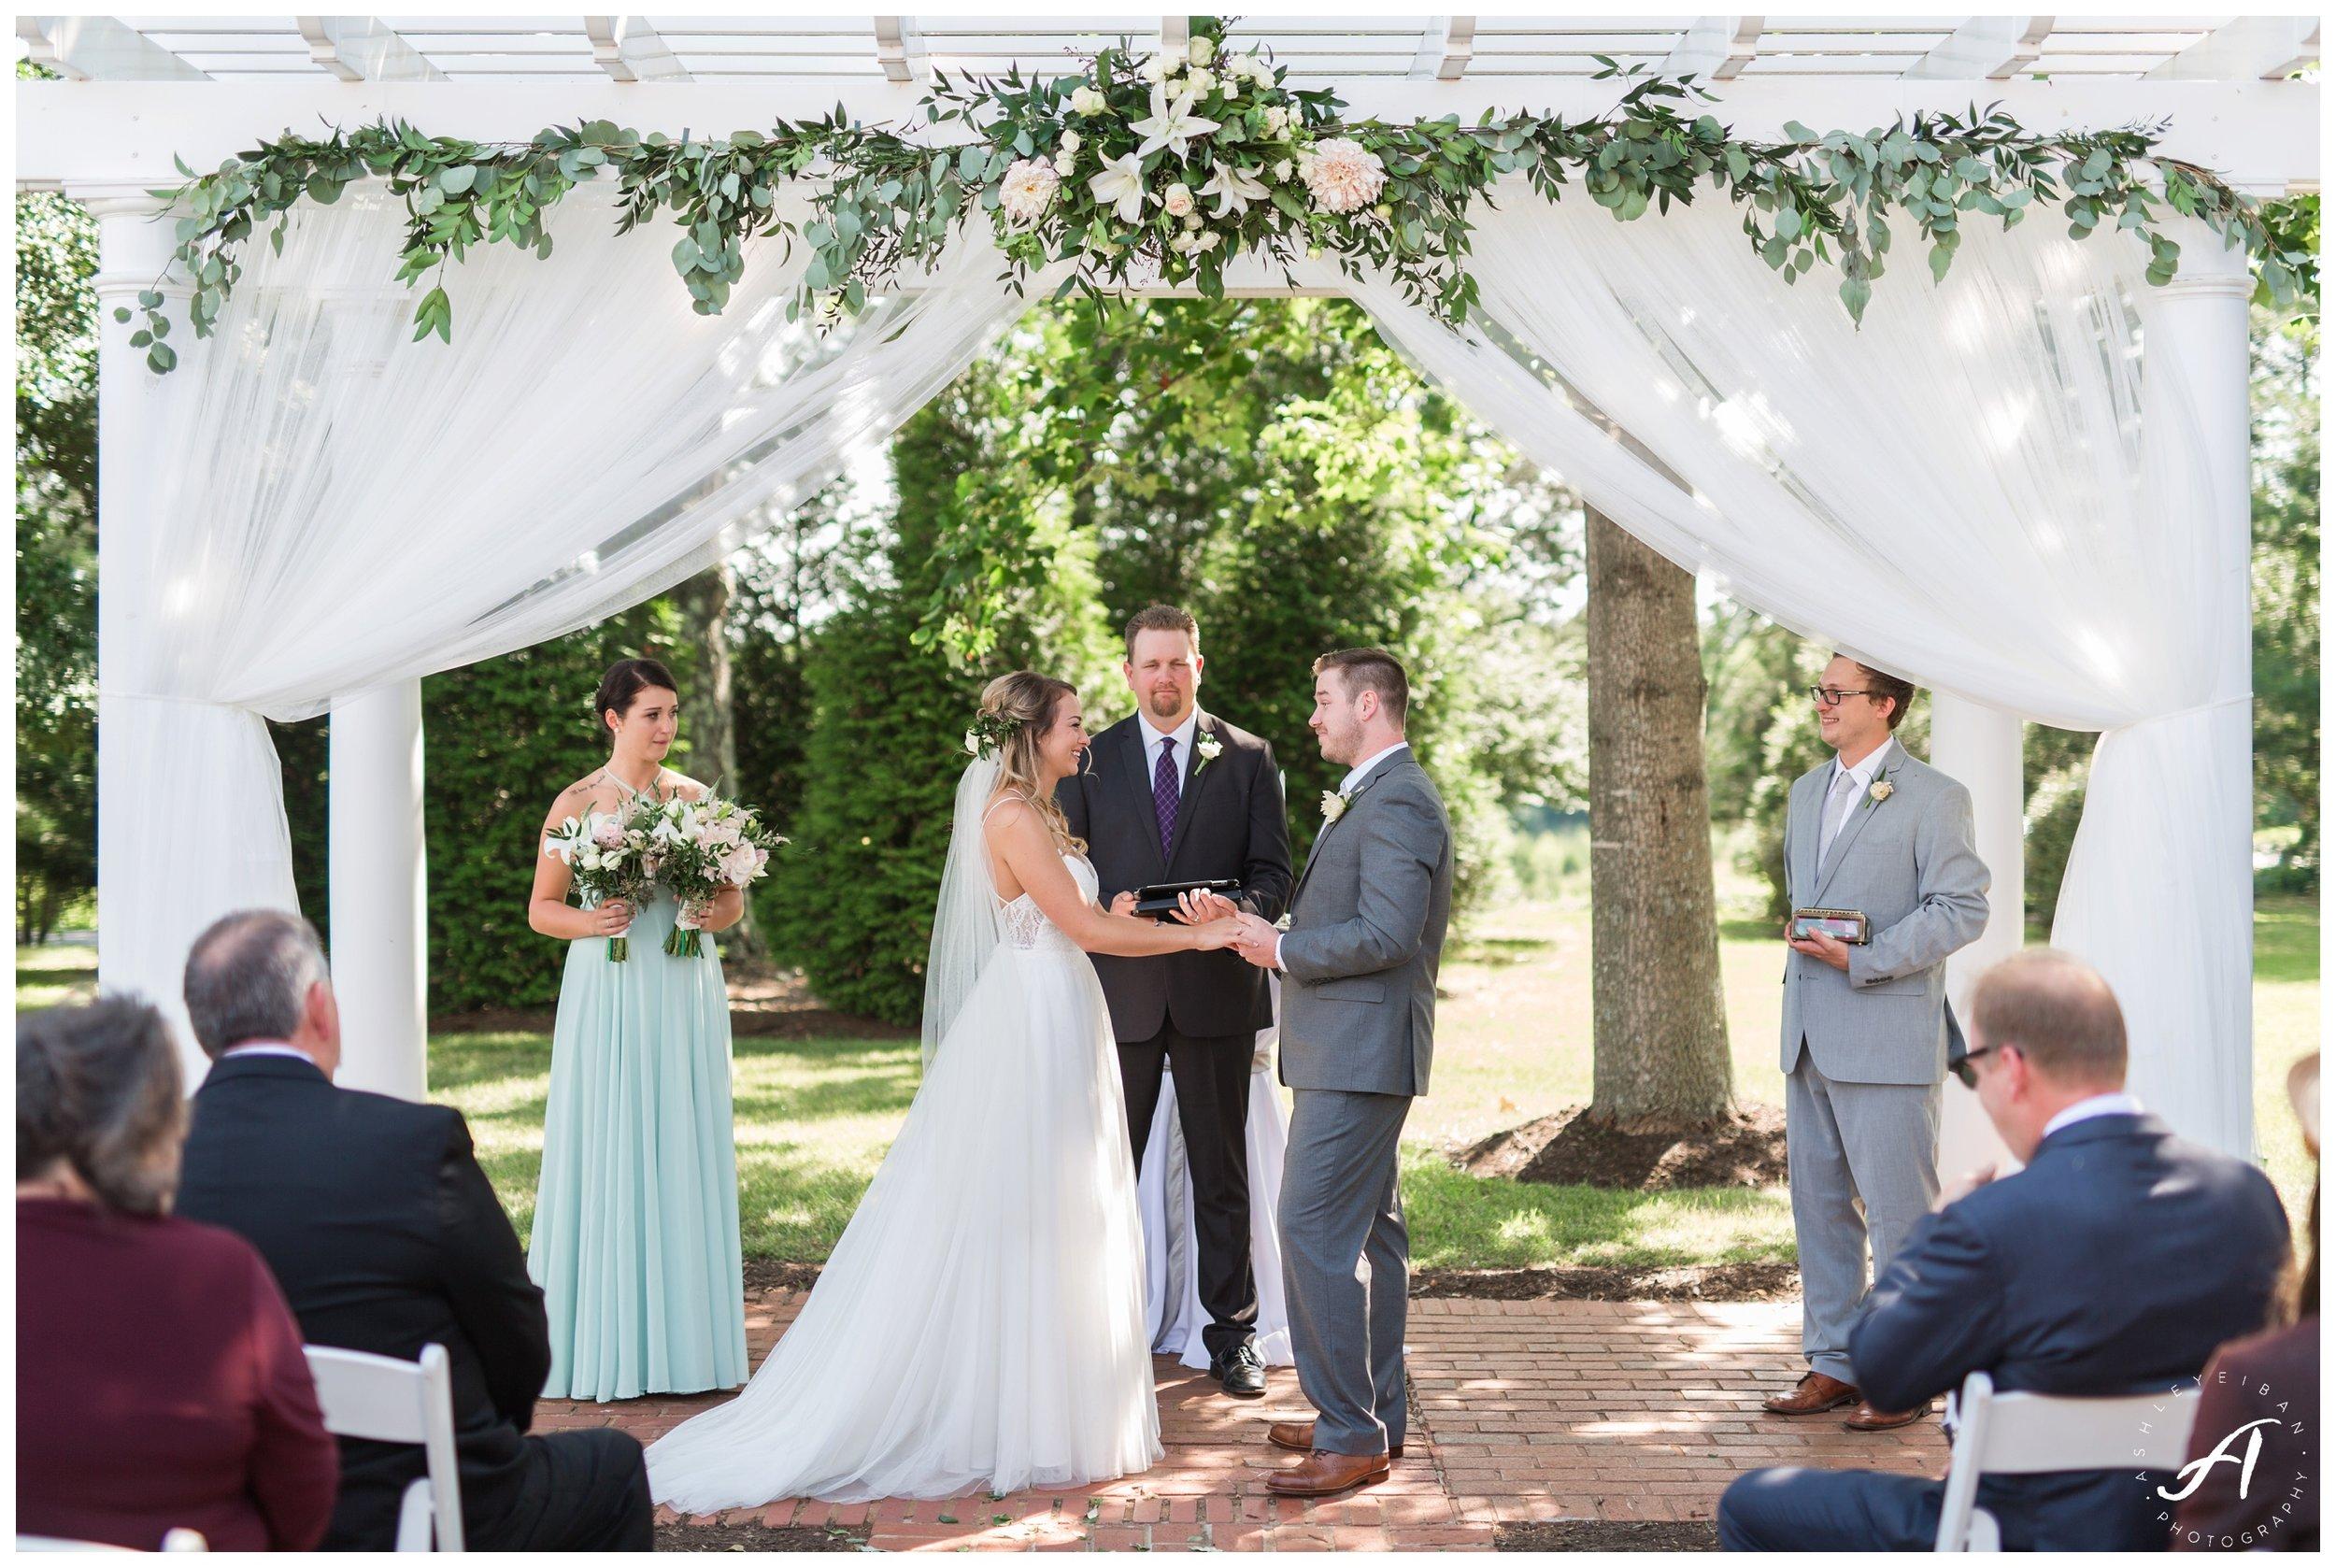 Lynchburg and Central Virginia Wedding Photographer || Trivium Estate Wedding Photos || Ashley Eiban Photography www.ashleyeiban.com